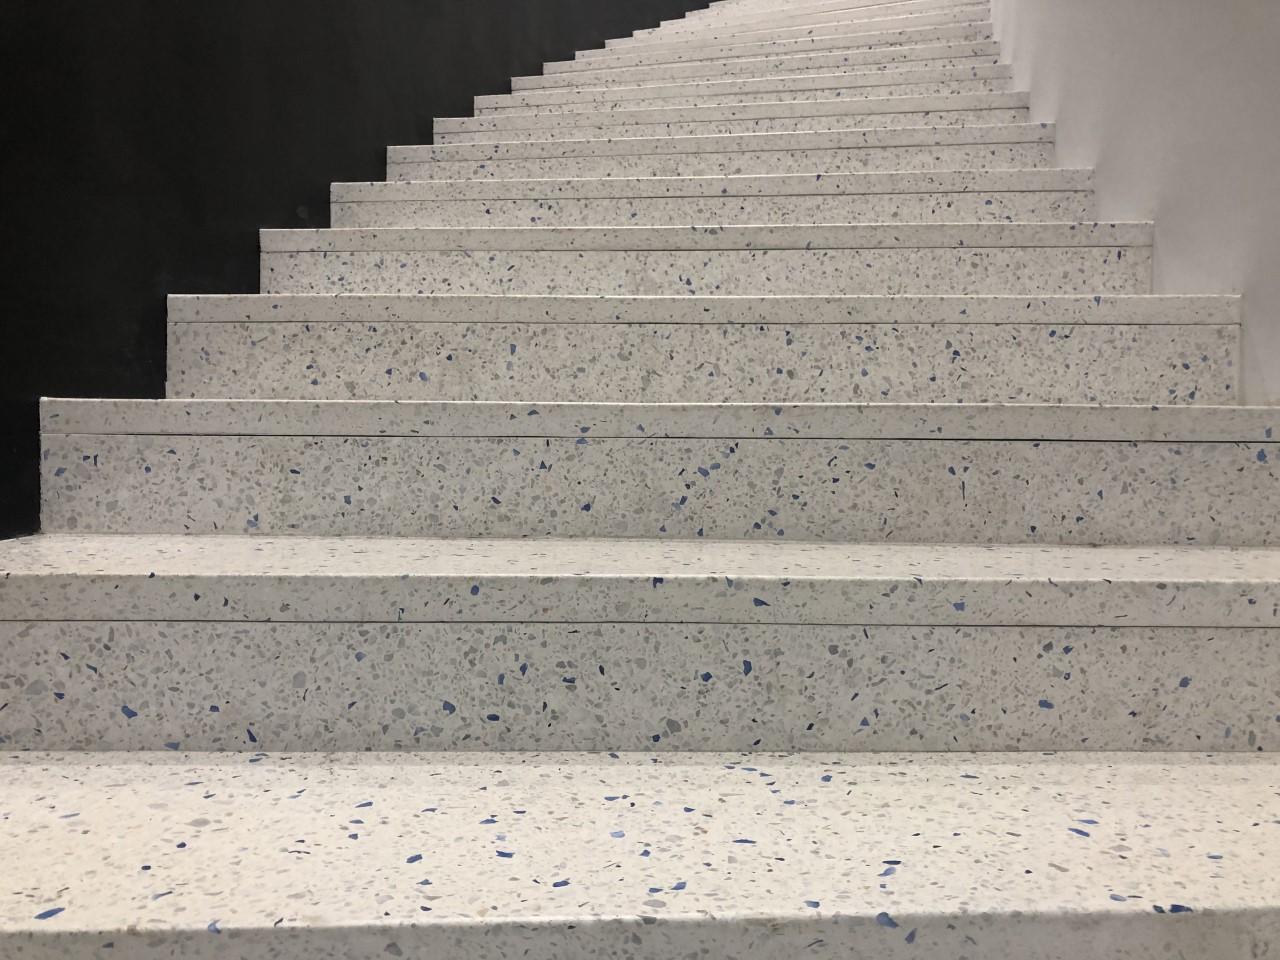 Escalier avec sol Terrazzo à Mulhouse: Matière & Design